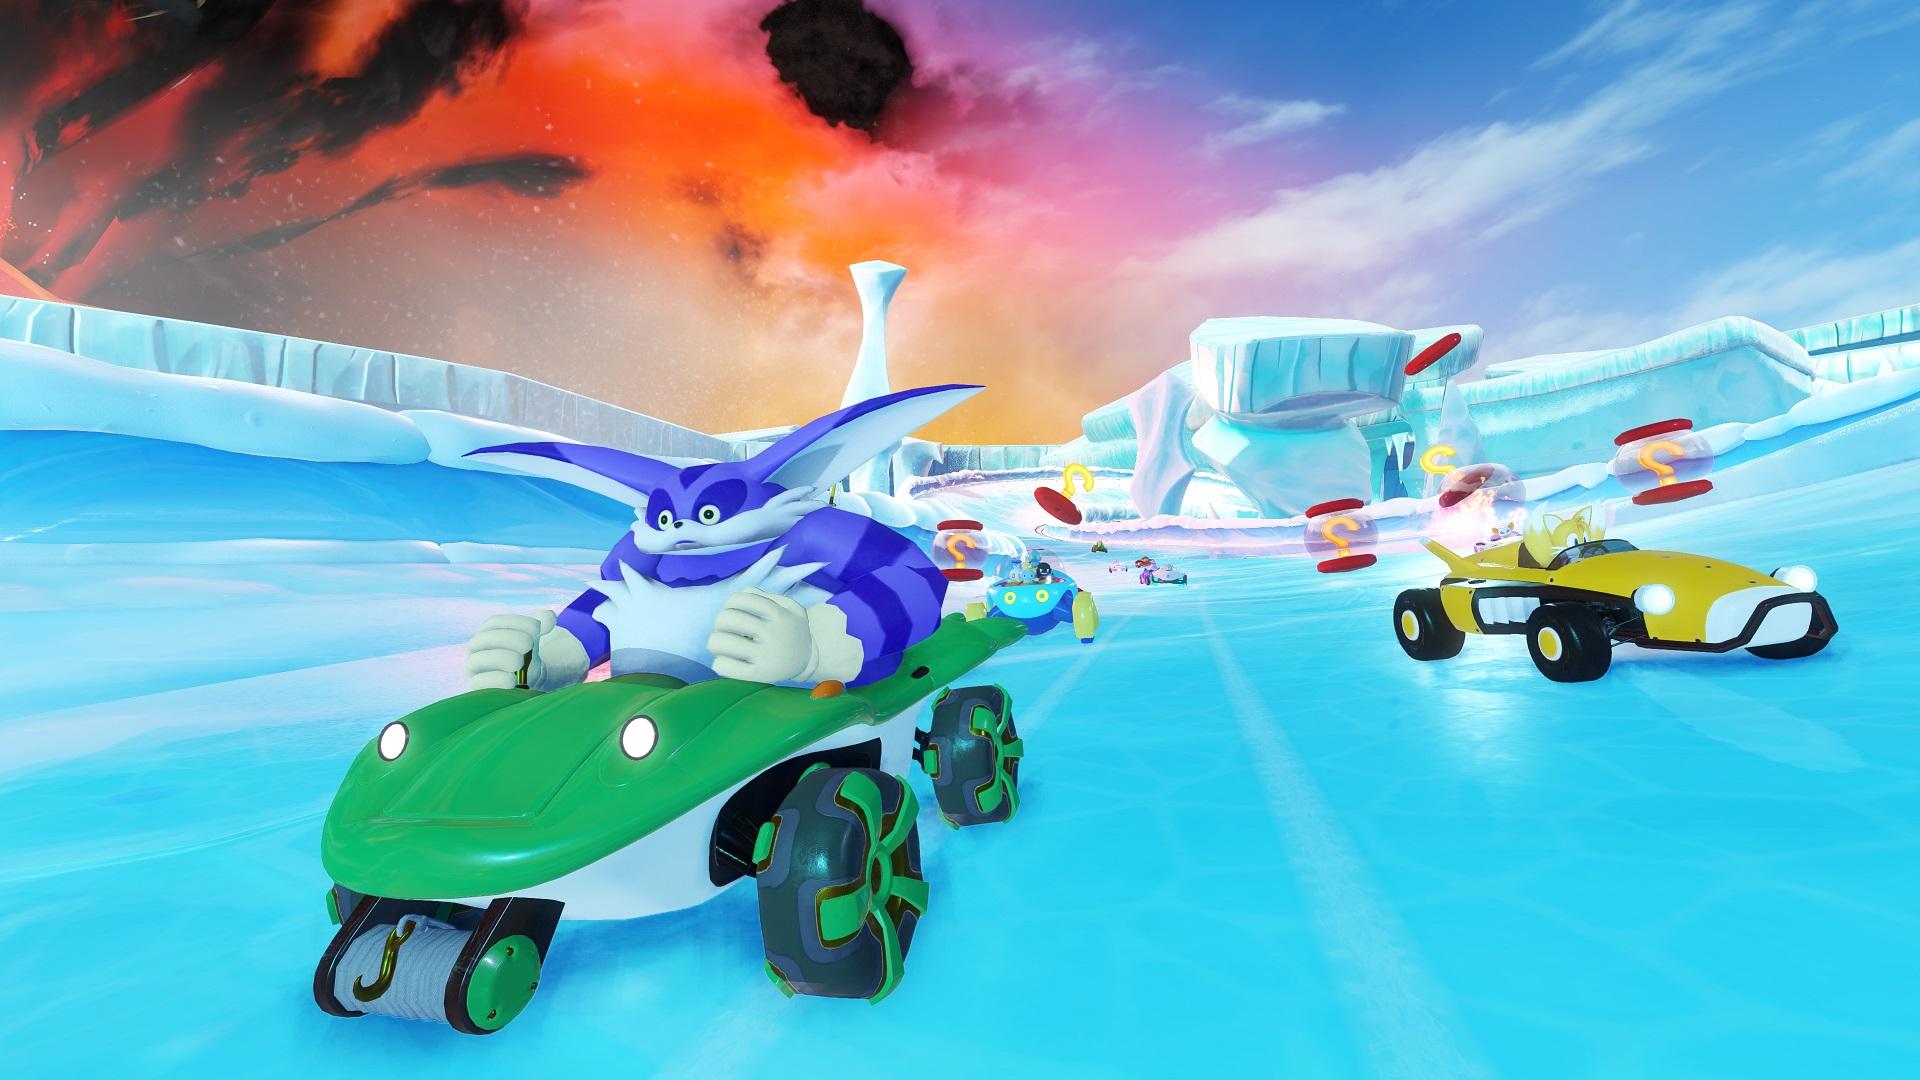 Download Team Sonic Racing Wallpaper 67440 1920x1080 px High